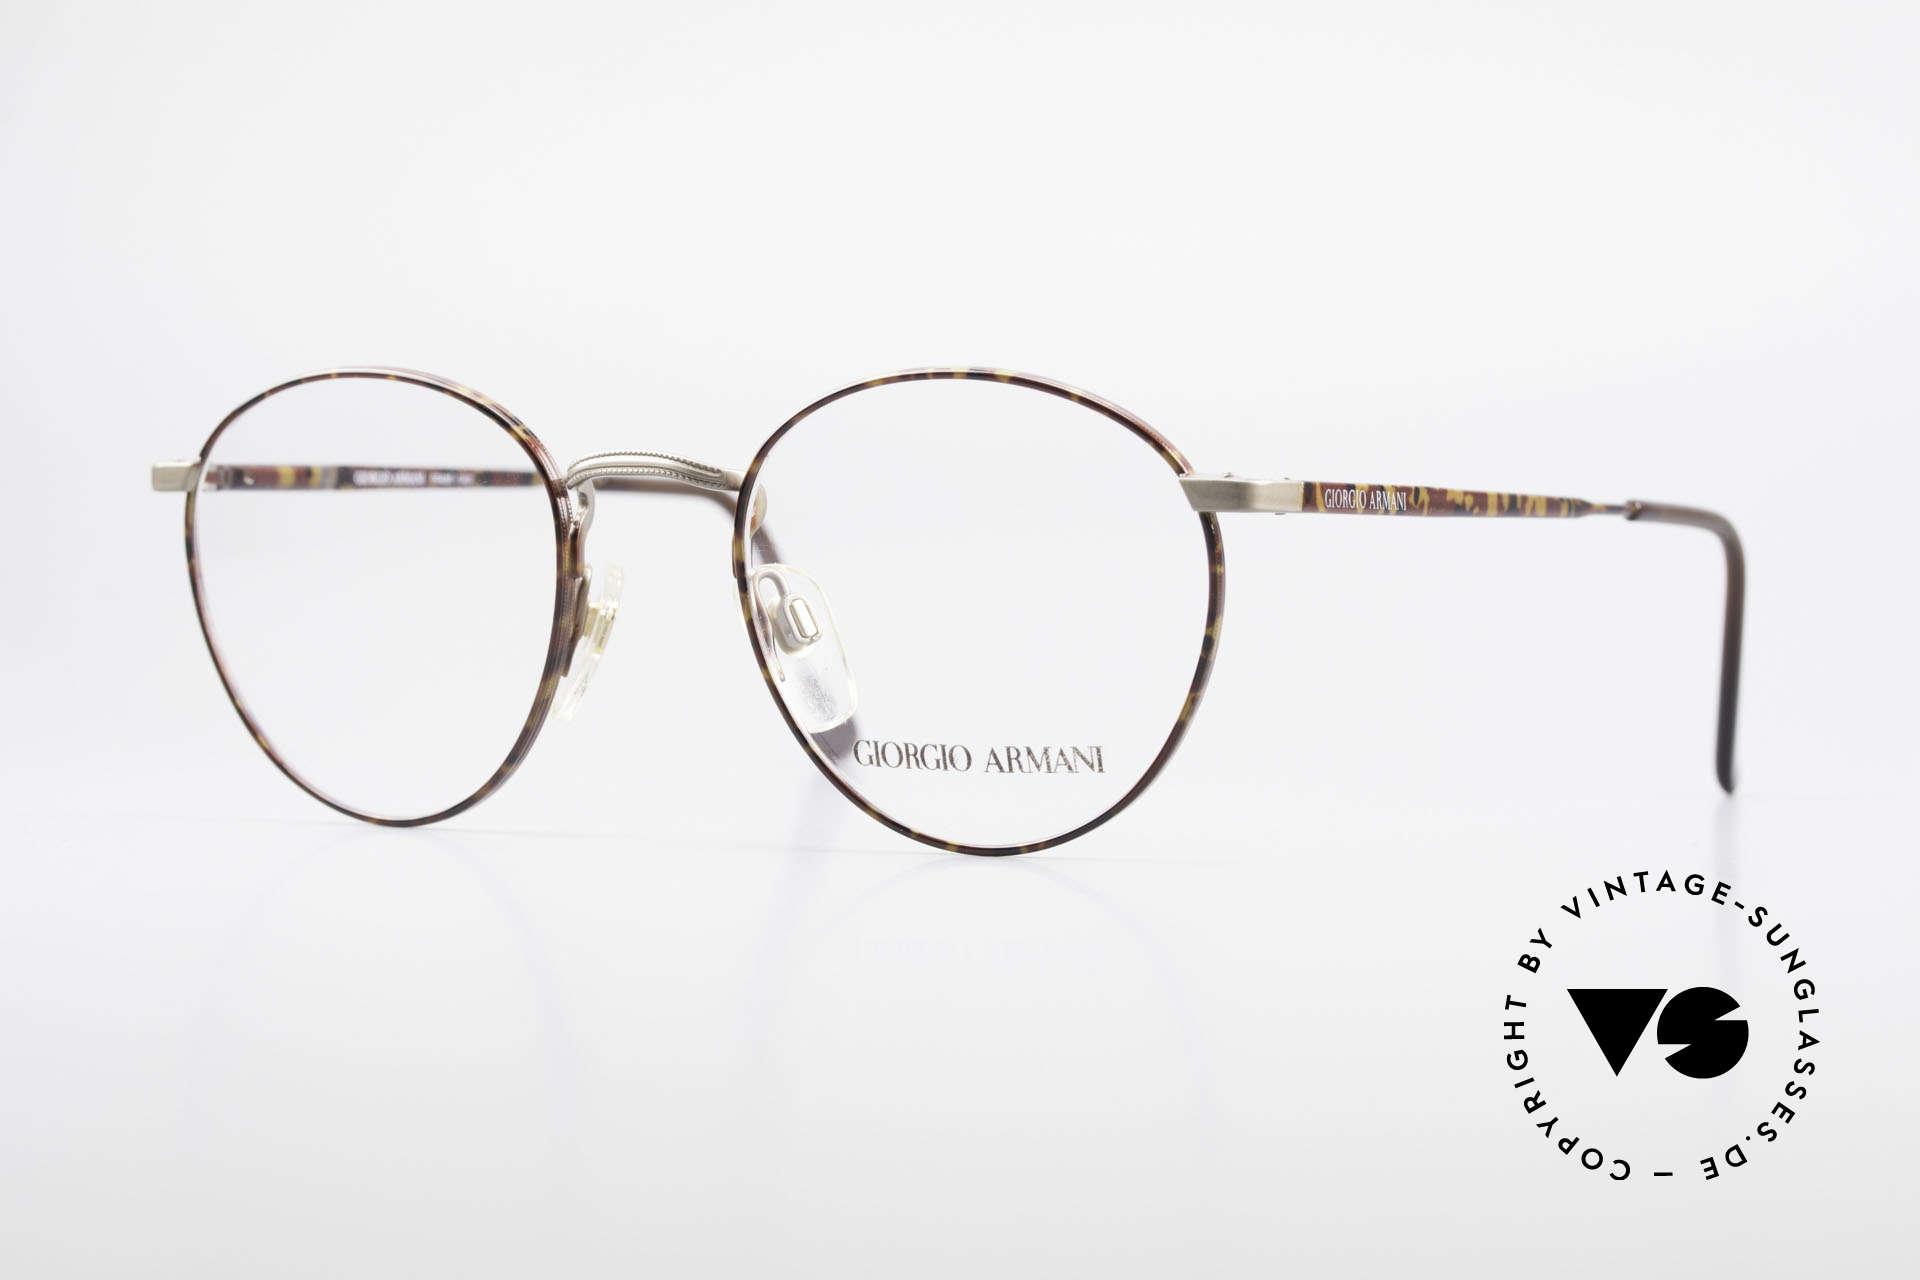 Giorgio Armani 166 No Retro Glasses 80's Panto, panto GIORGIO ARMANI vintage designer eyeglasses, Made for Men